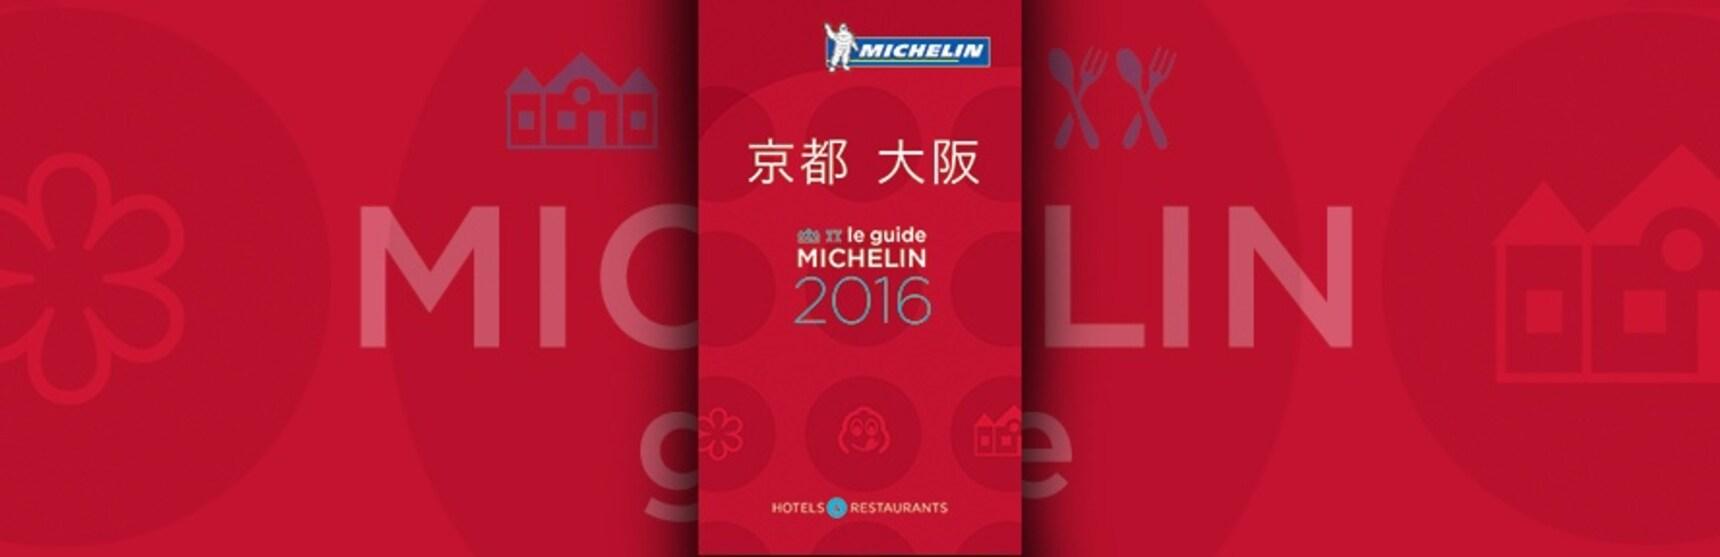 Michelin 2016: Kyoto, Nara, Kobe & Osaka